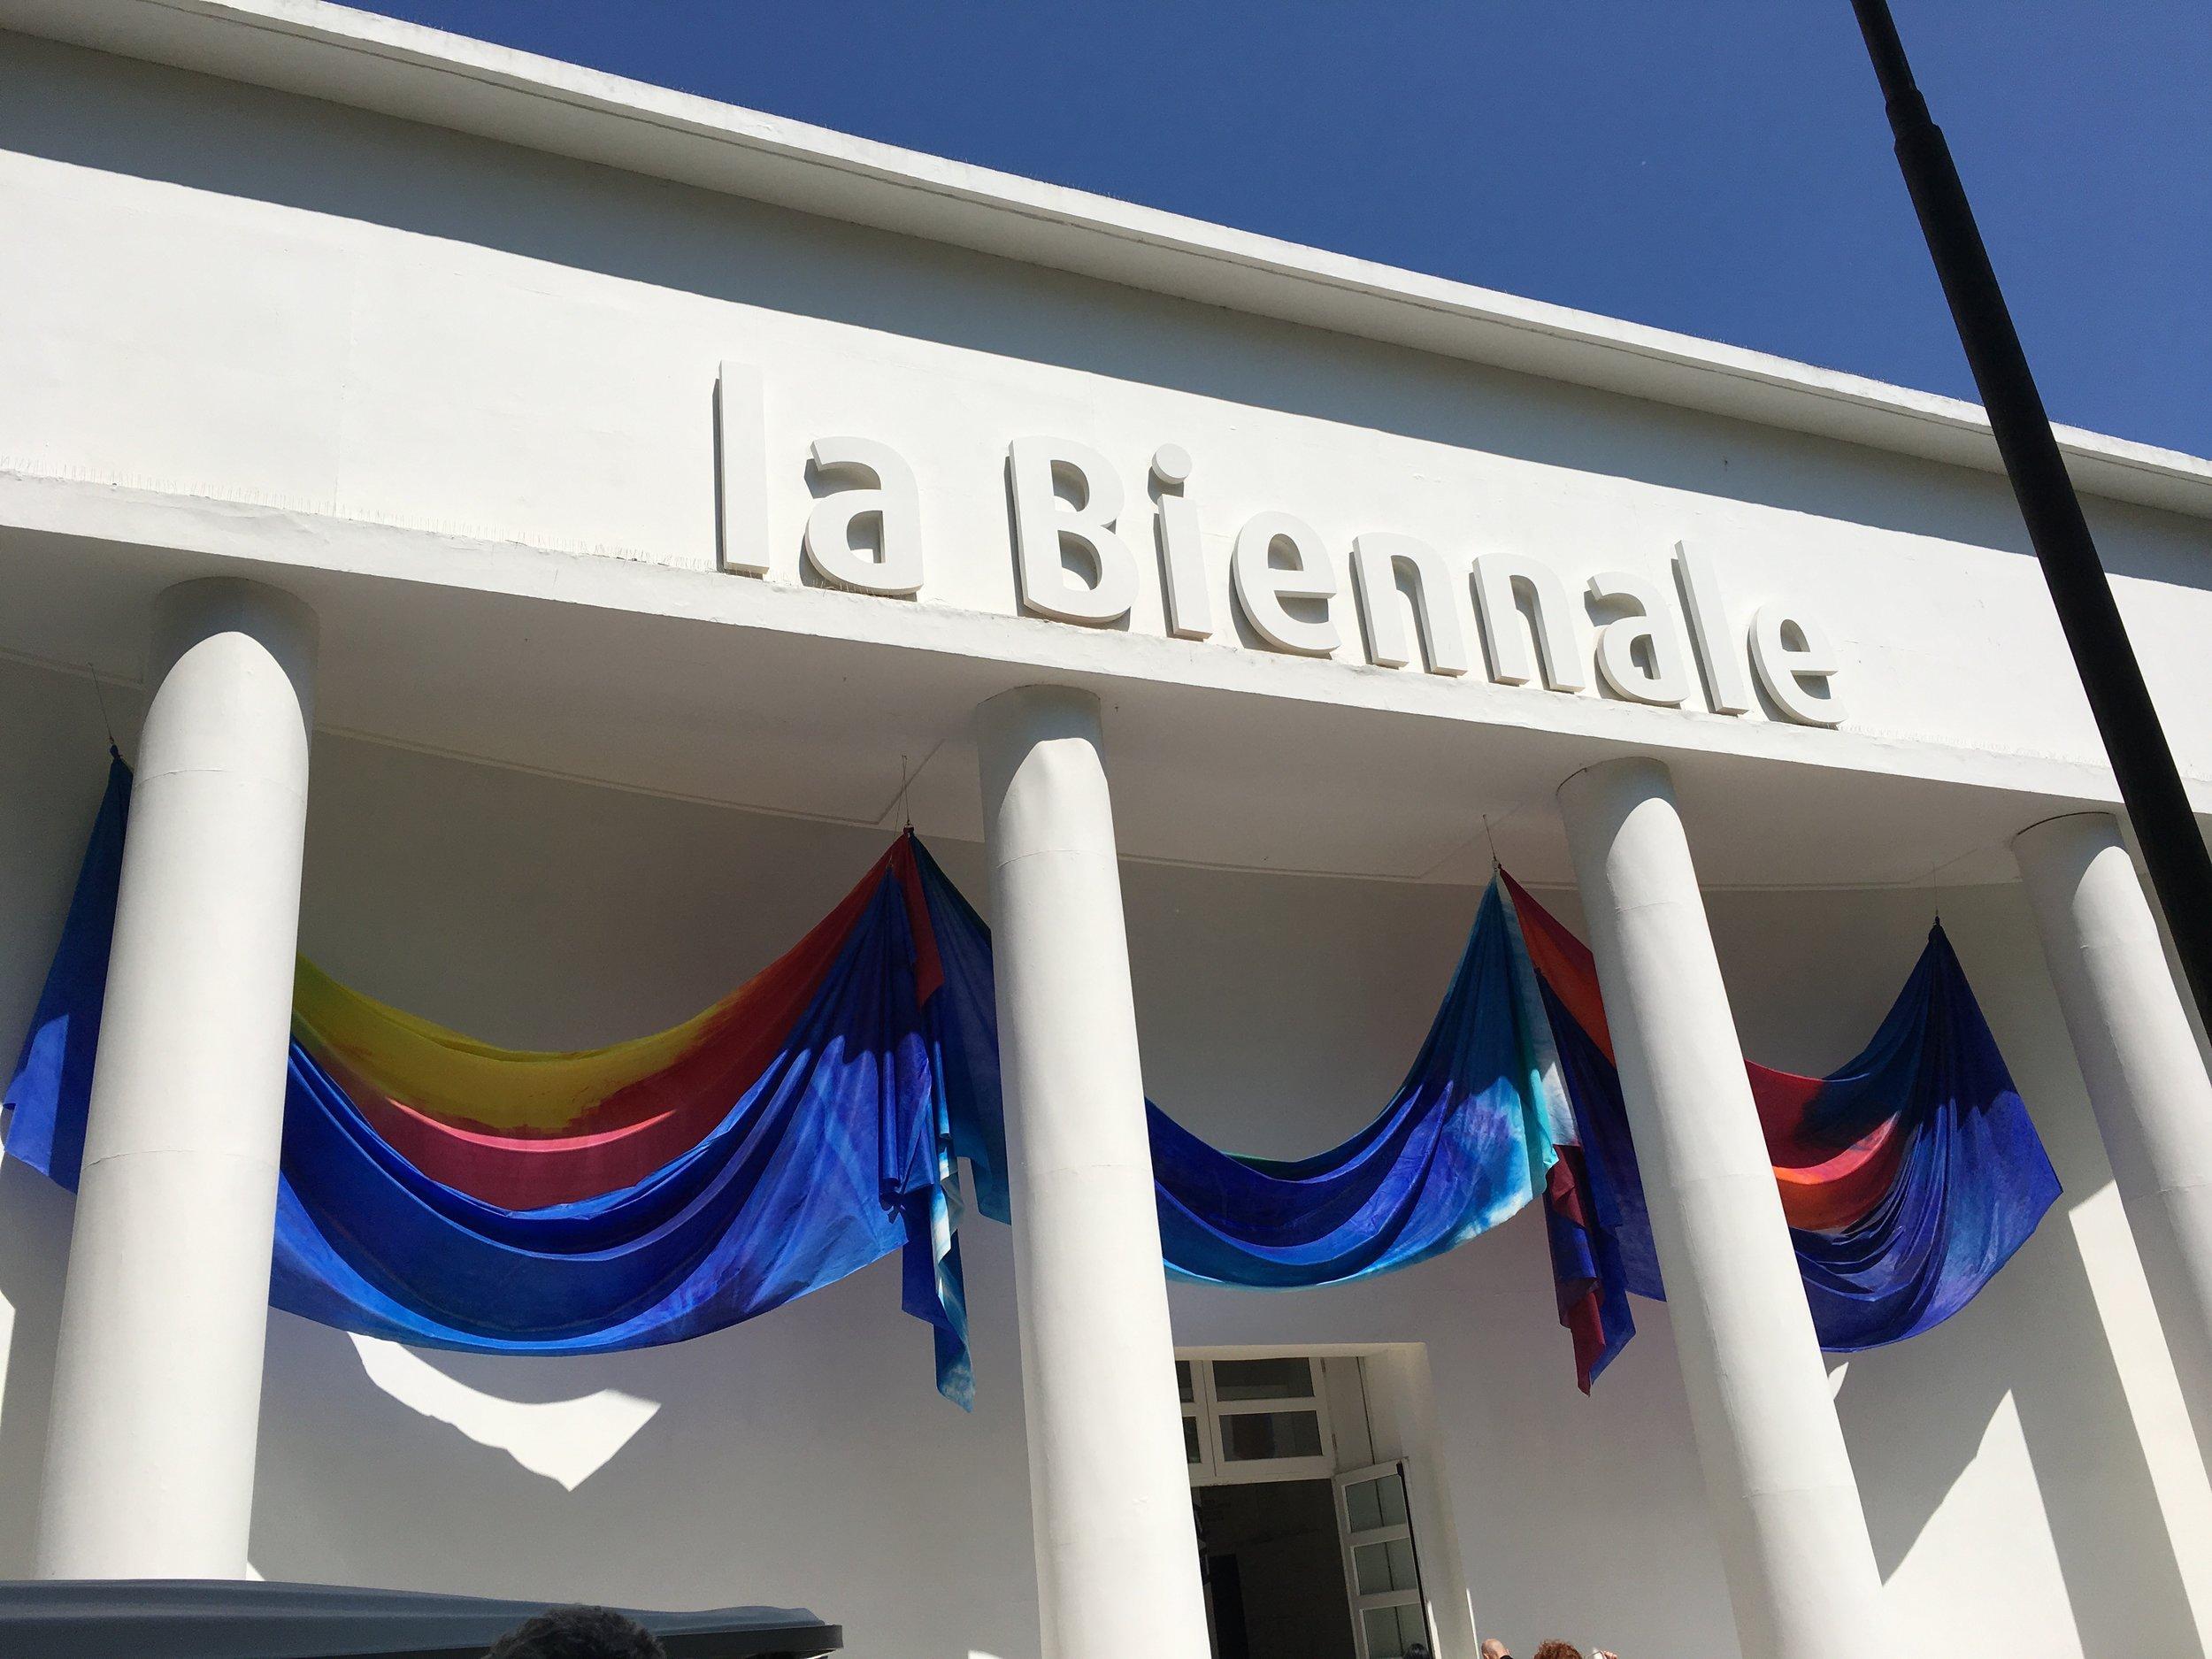 Venice Biennale, Italian Pavilion, Banner by Sam Gilliam, 2017